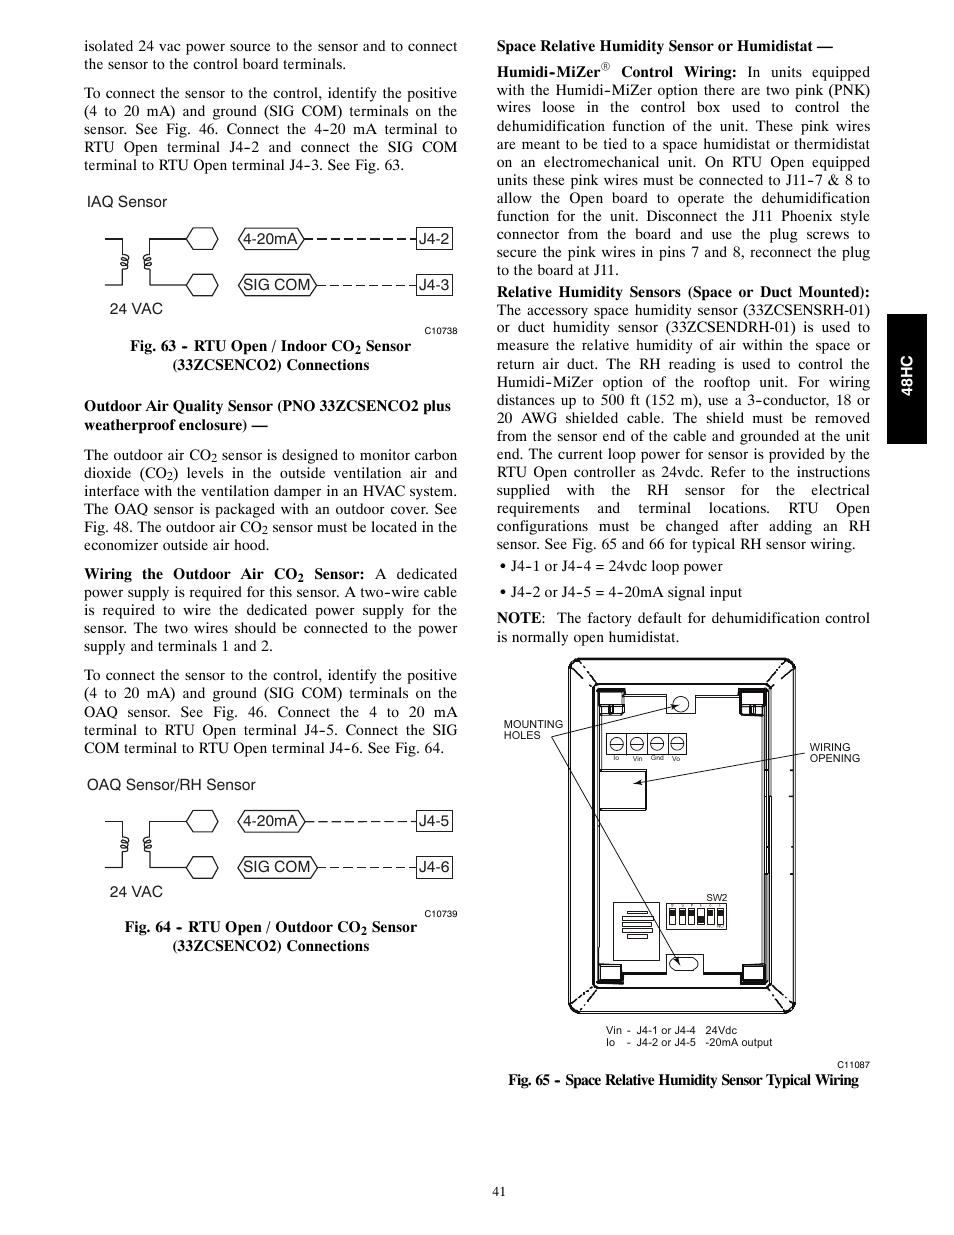 Co2 Sensor Wiring Diagram Detailed Schematics 2000 Deville Speed Wire Carrier 48 Series Free Download U2022 Oasis Dl Co Toyota O2